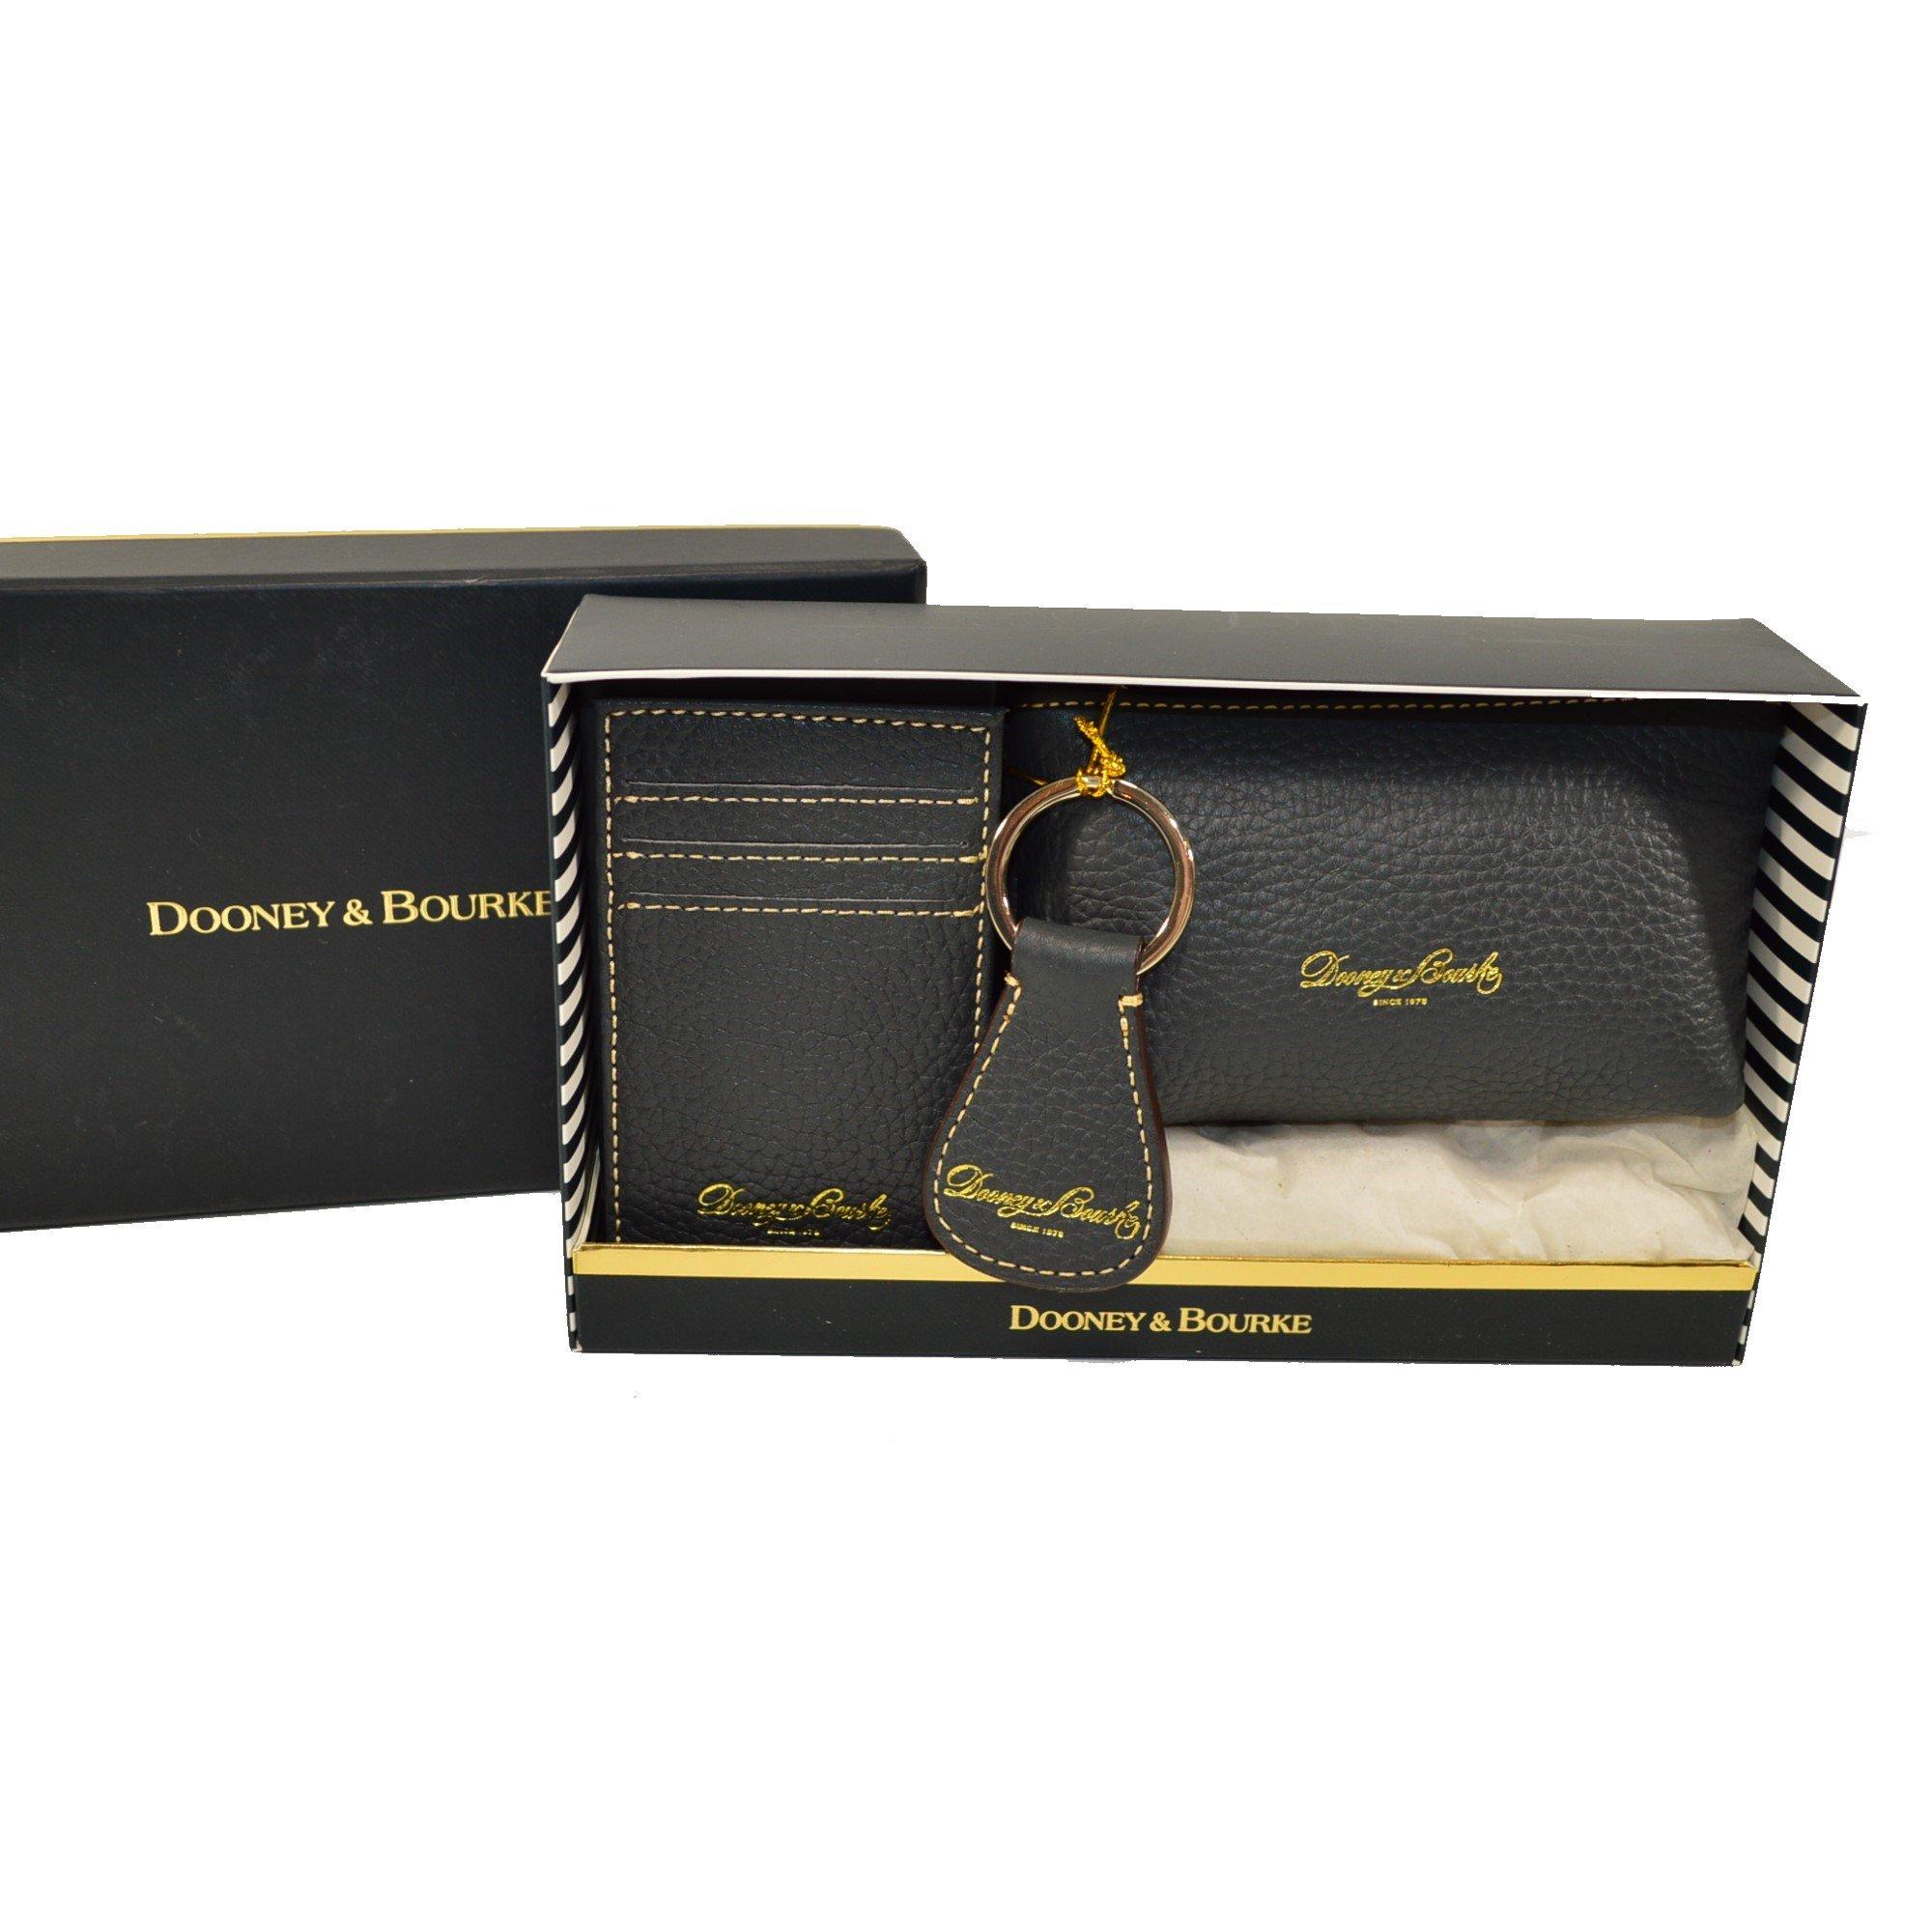 Dooney & Bourke Pebble Leather 3 pc boxed gift set Dark Grey